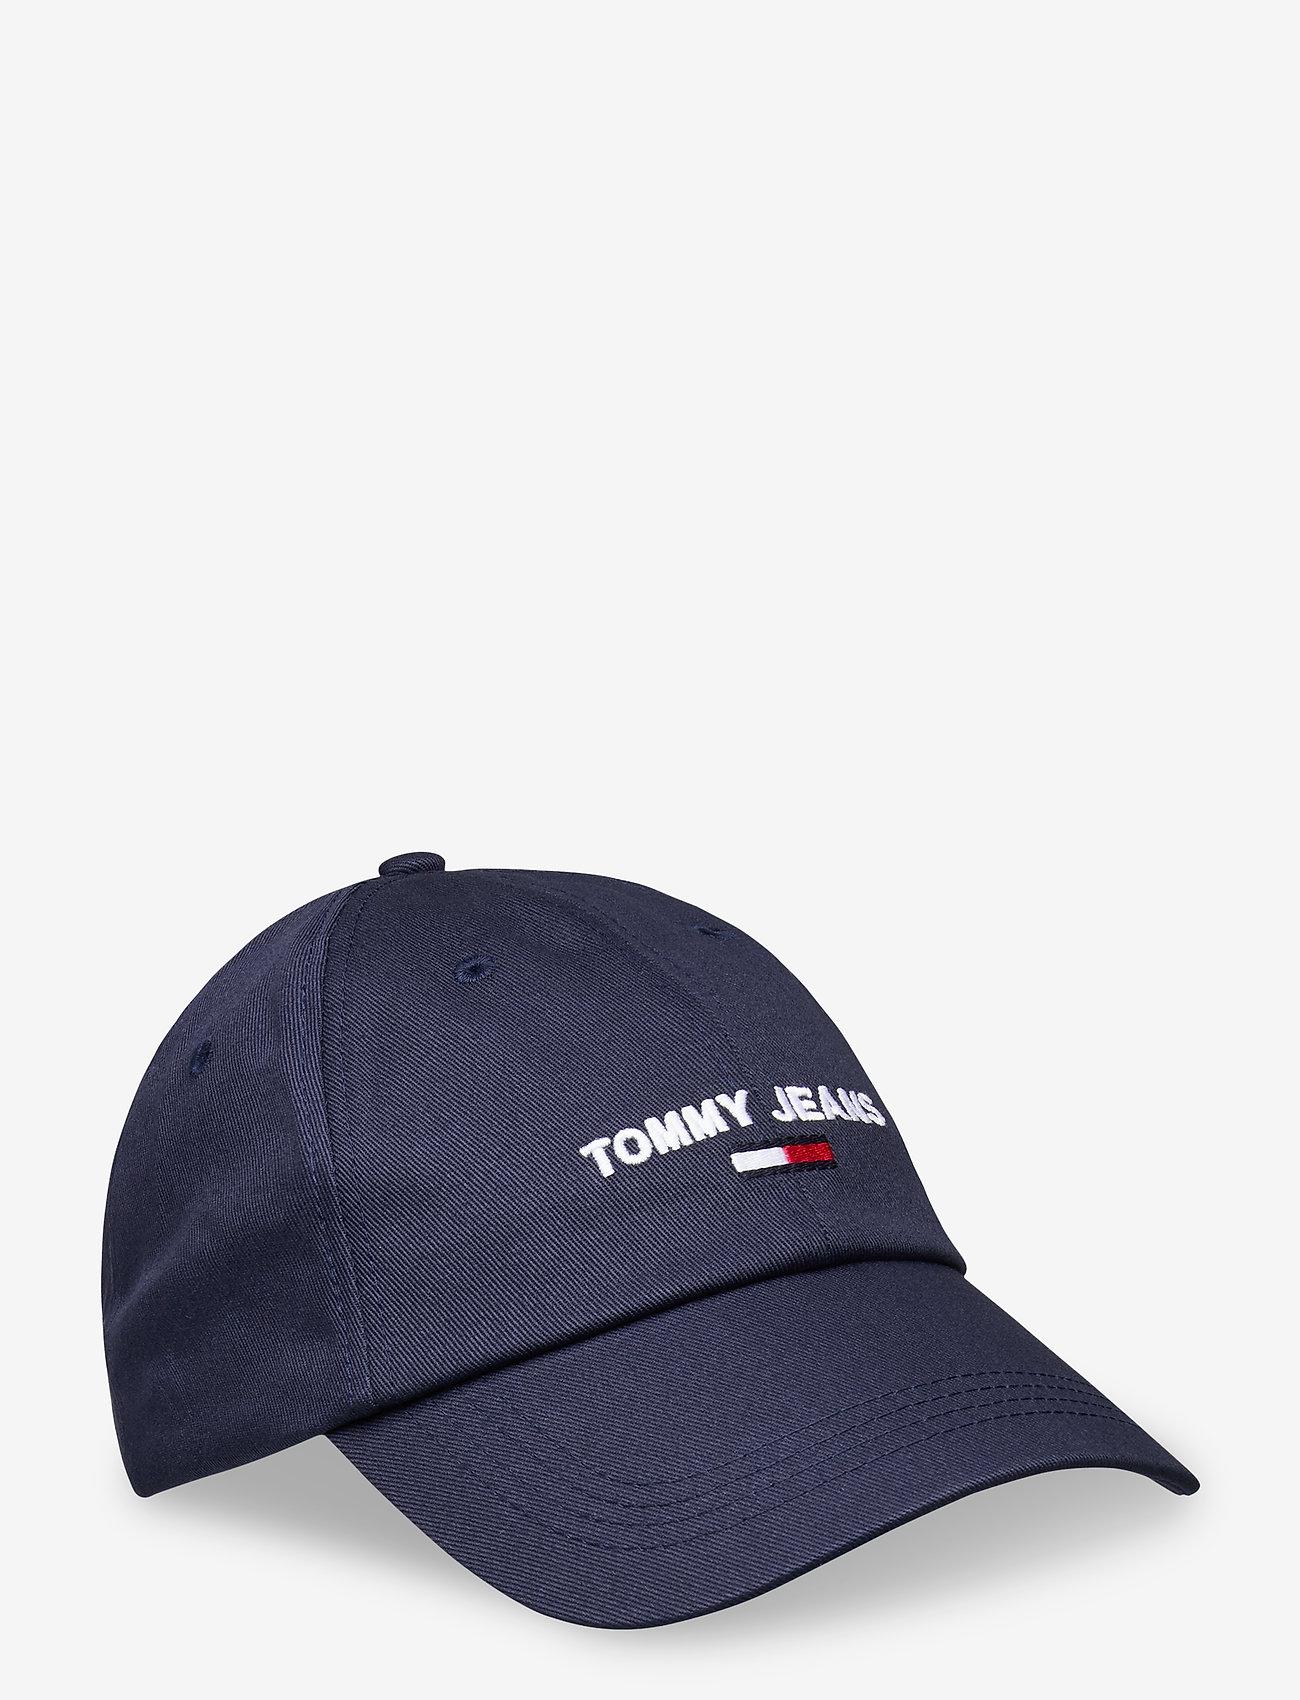 Tommy Hilfiger - TJM SPORT CAP - casquettes - twilight navy - 0